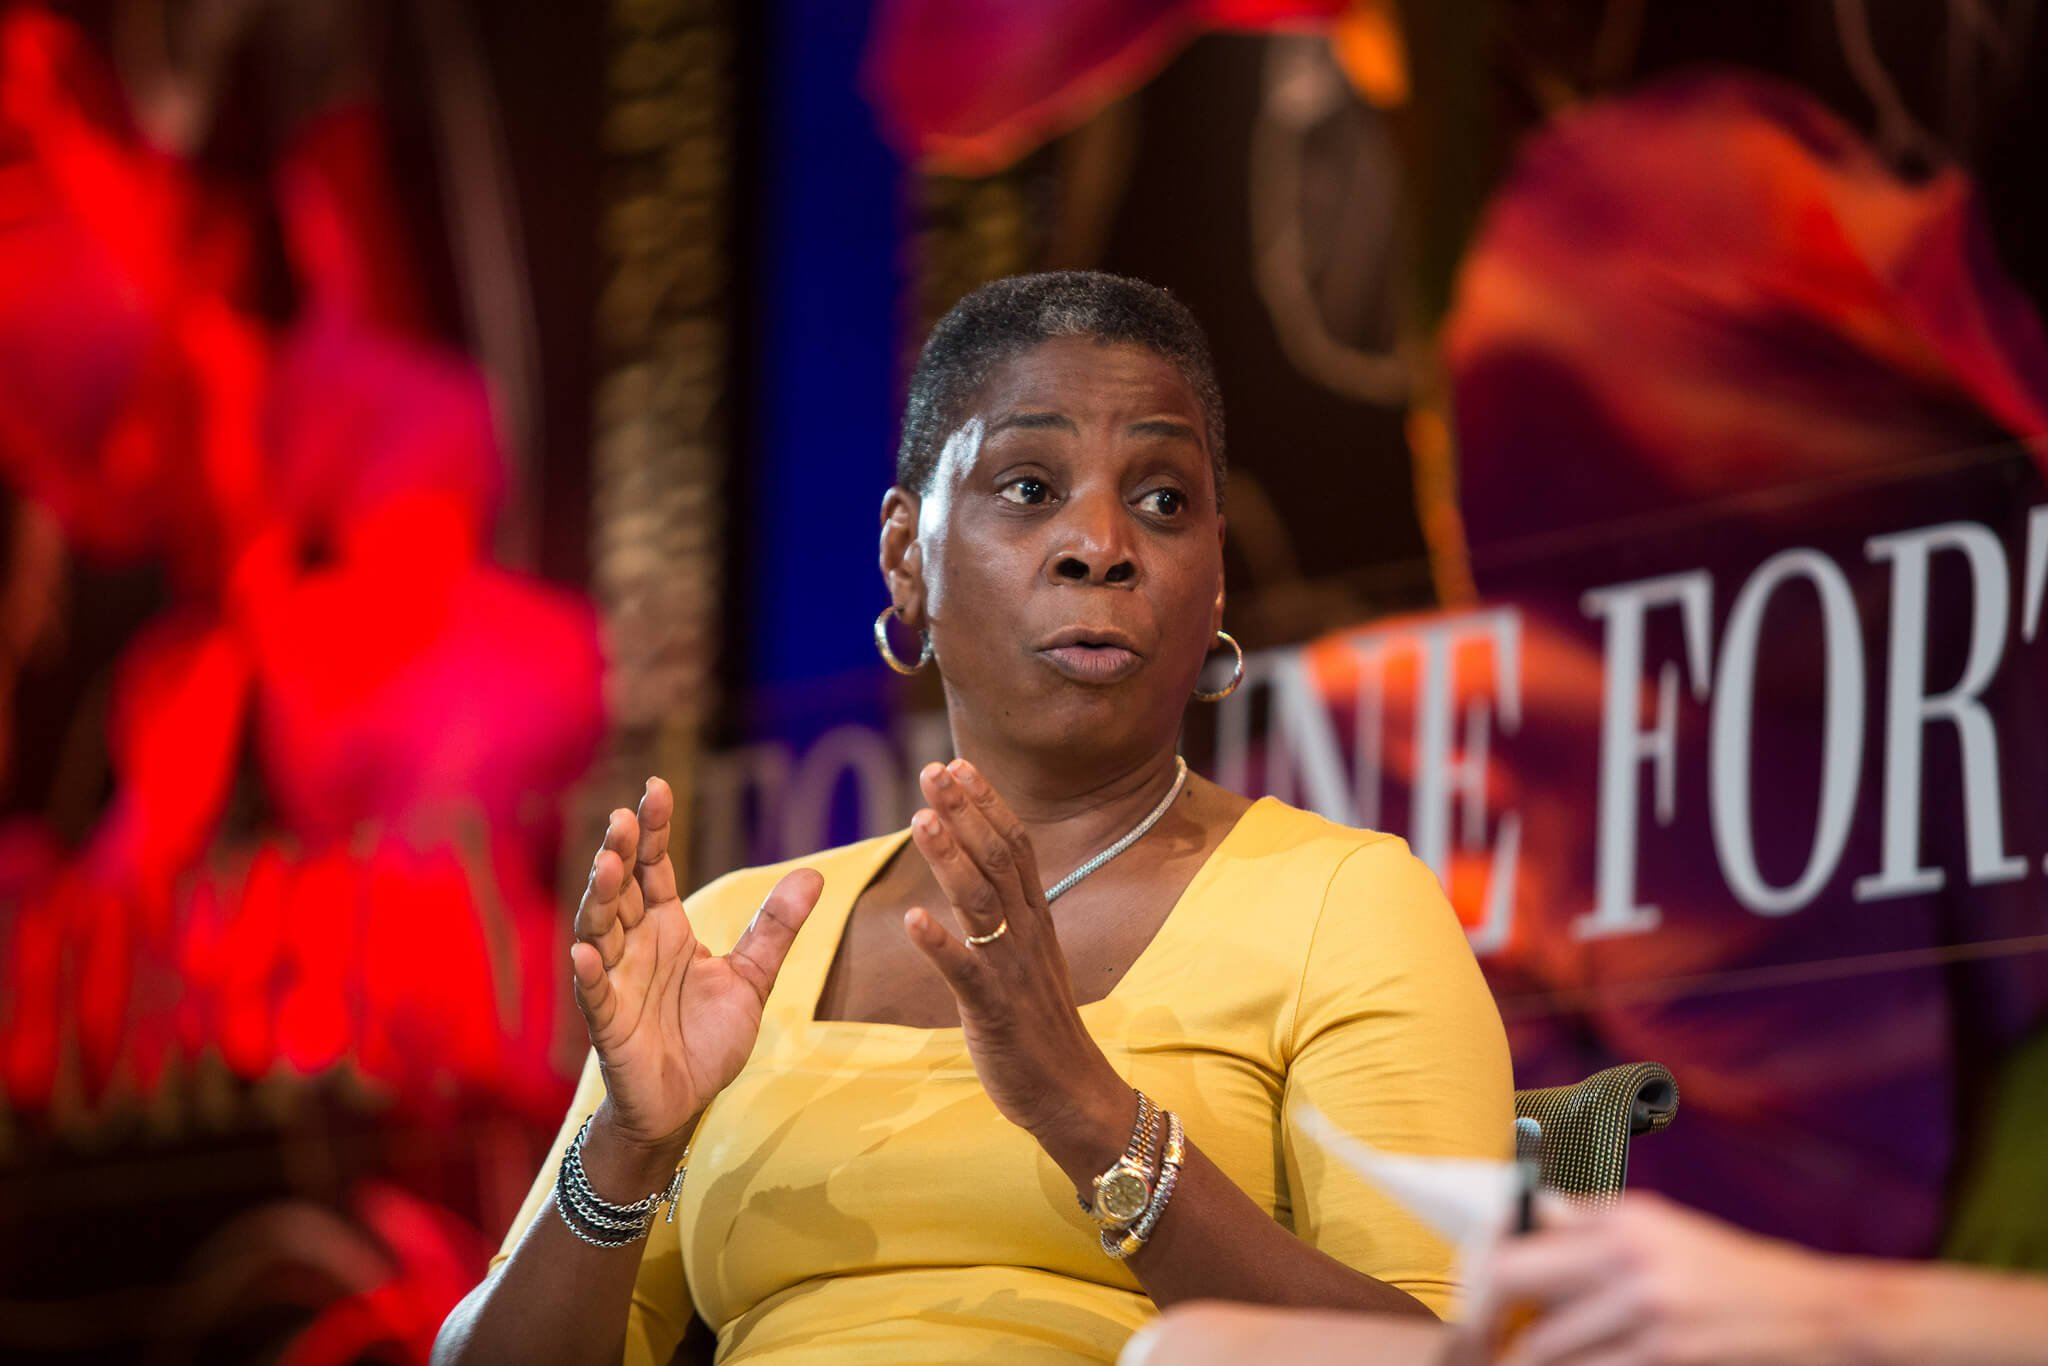 CEO Spotlight: VEON Chairwoman Ursula Burns